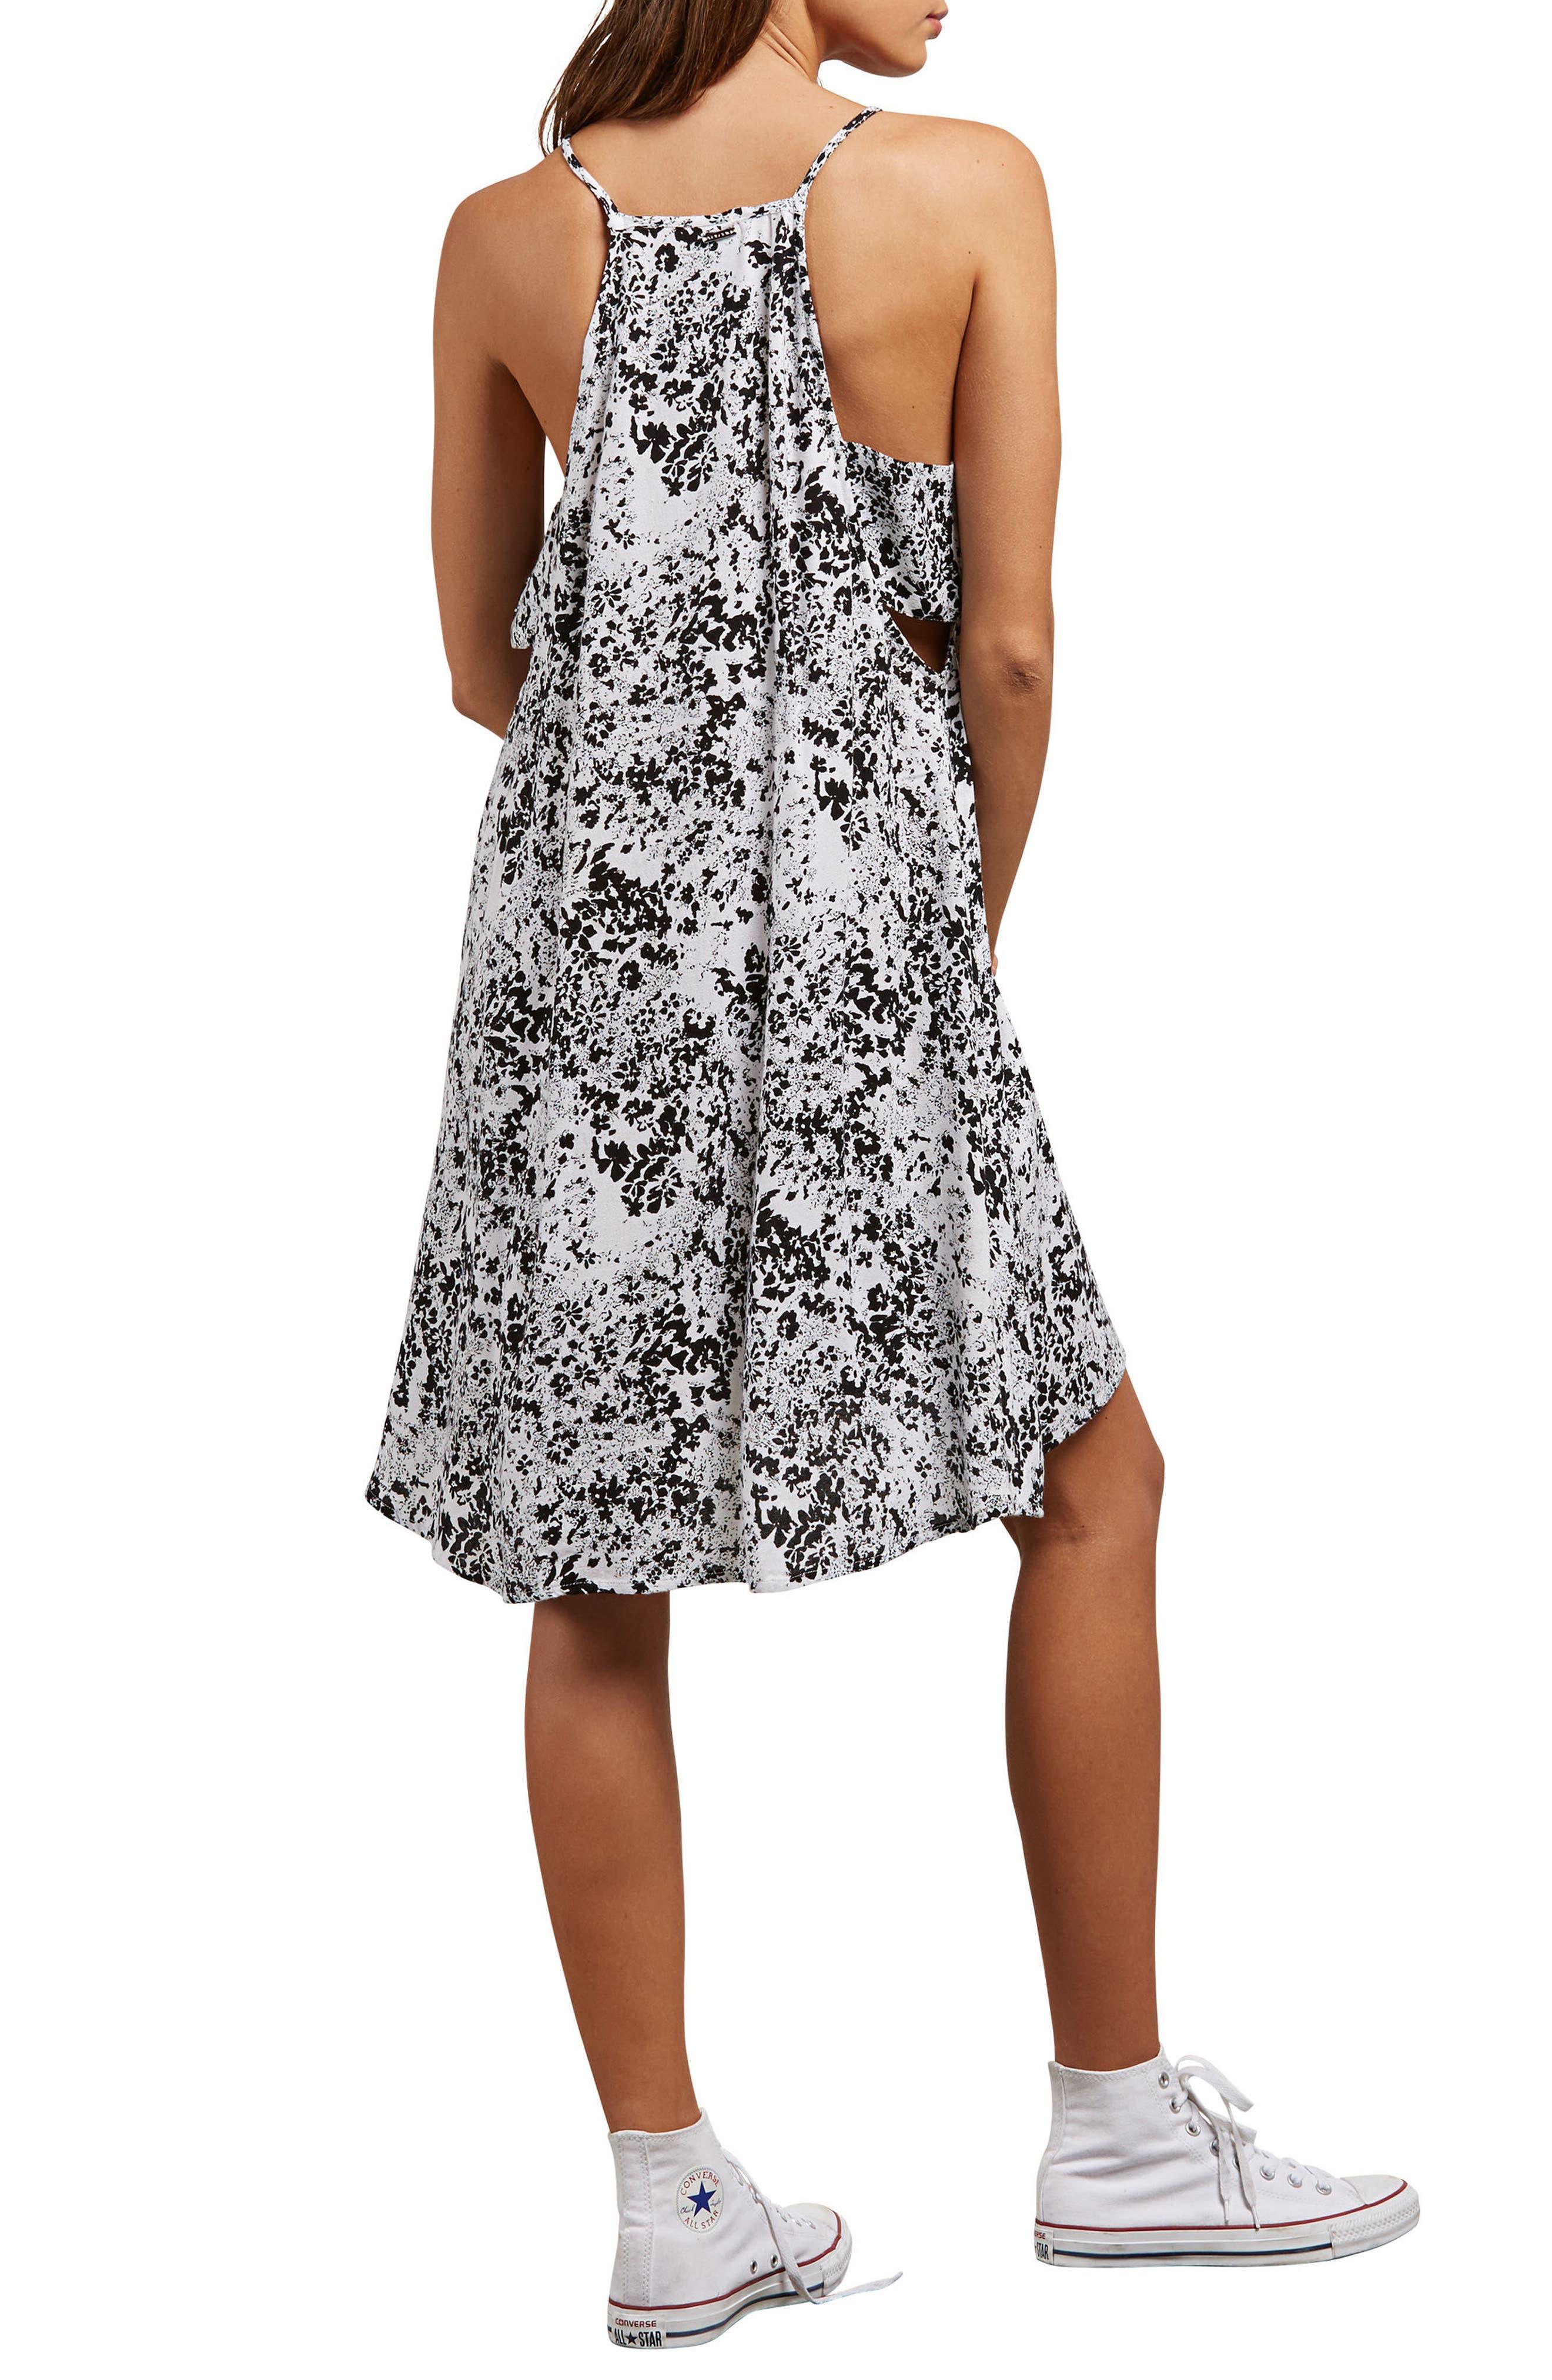 Soul Window Dress,                             Alternate thumbnail 2, color,                             Black/ White